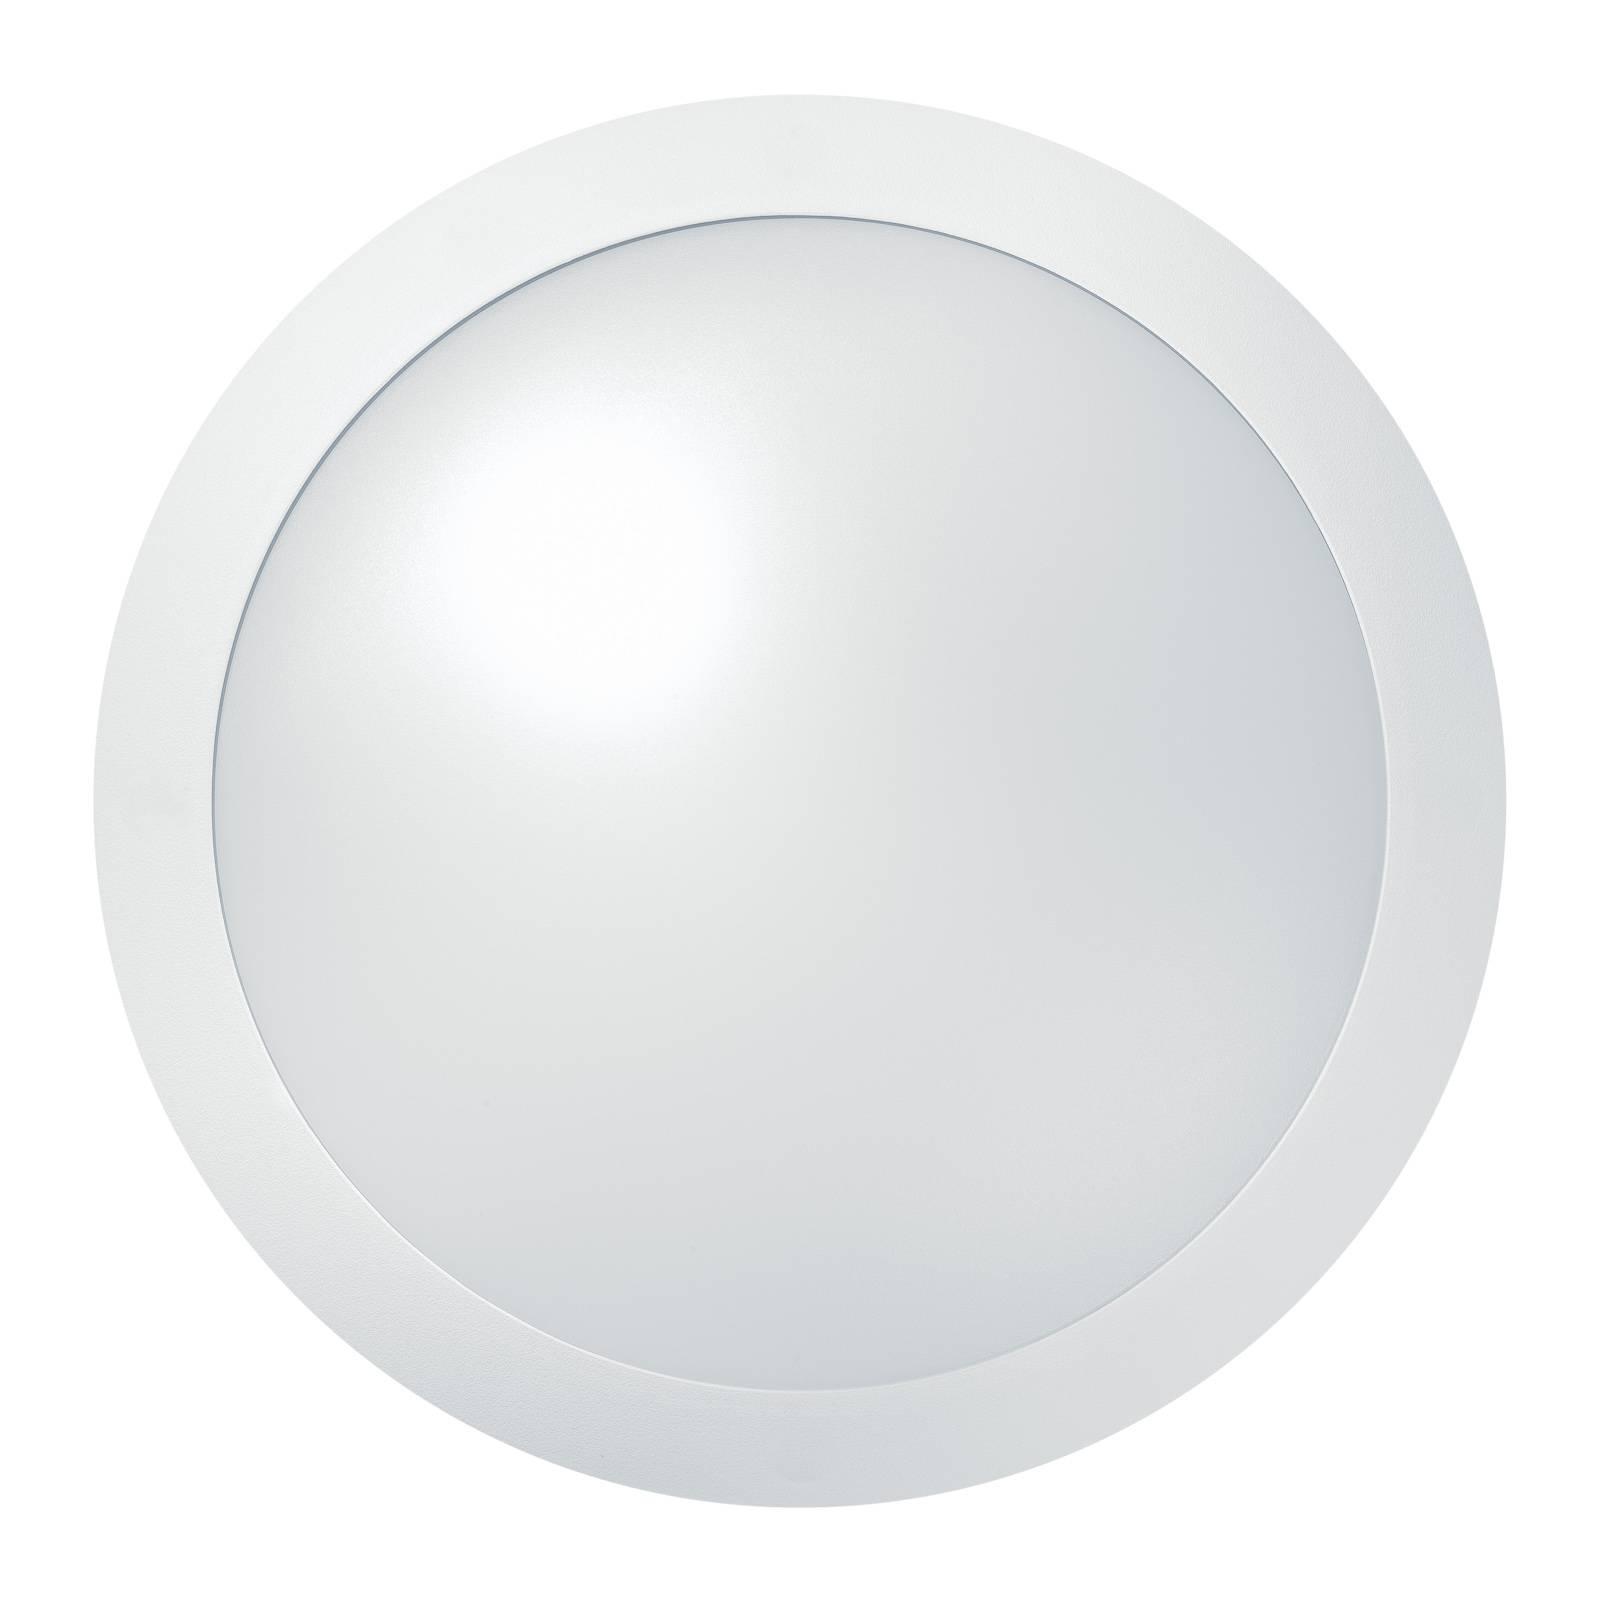 THORNeco Tom Vario LED-Wandleuchte 14W Sensor weiß